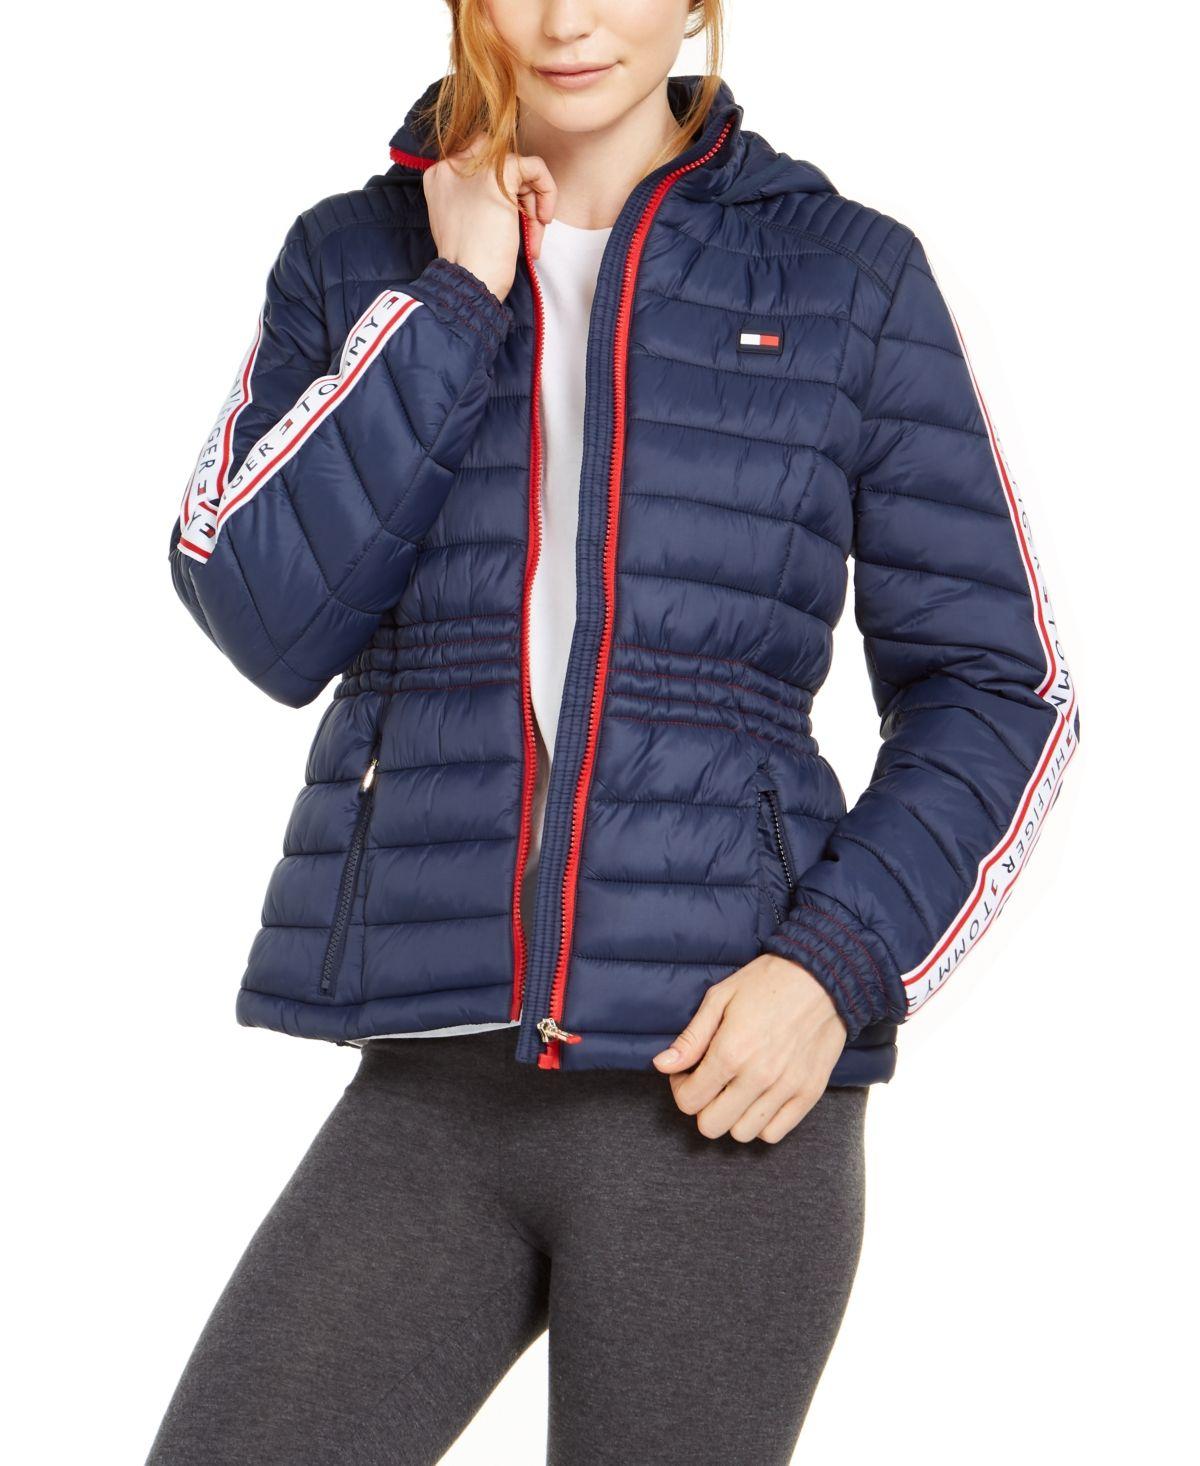 Pin By Alejandraperez On Winter Outfits Blazer Jackets For Women Quilted Puffer Jacket Puffer Jacket Women [ 1466 x 1200 Pixel ]